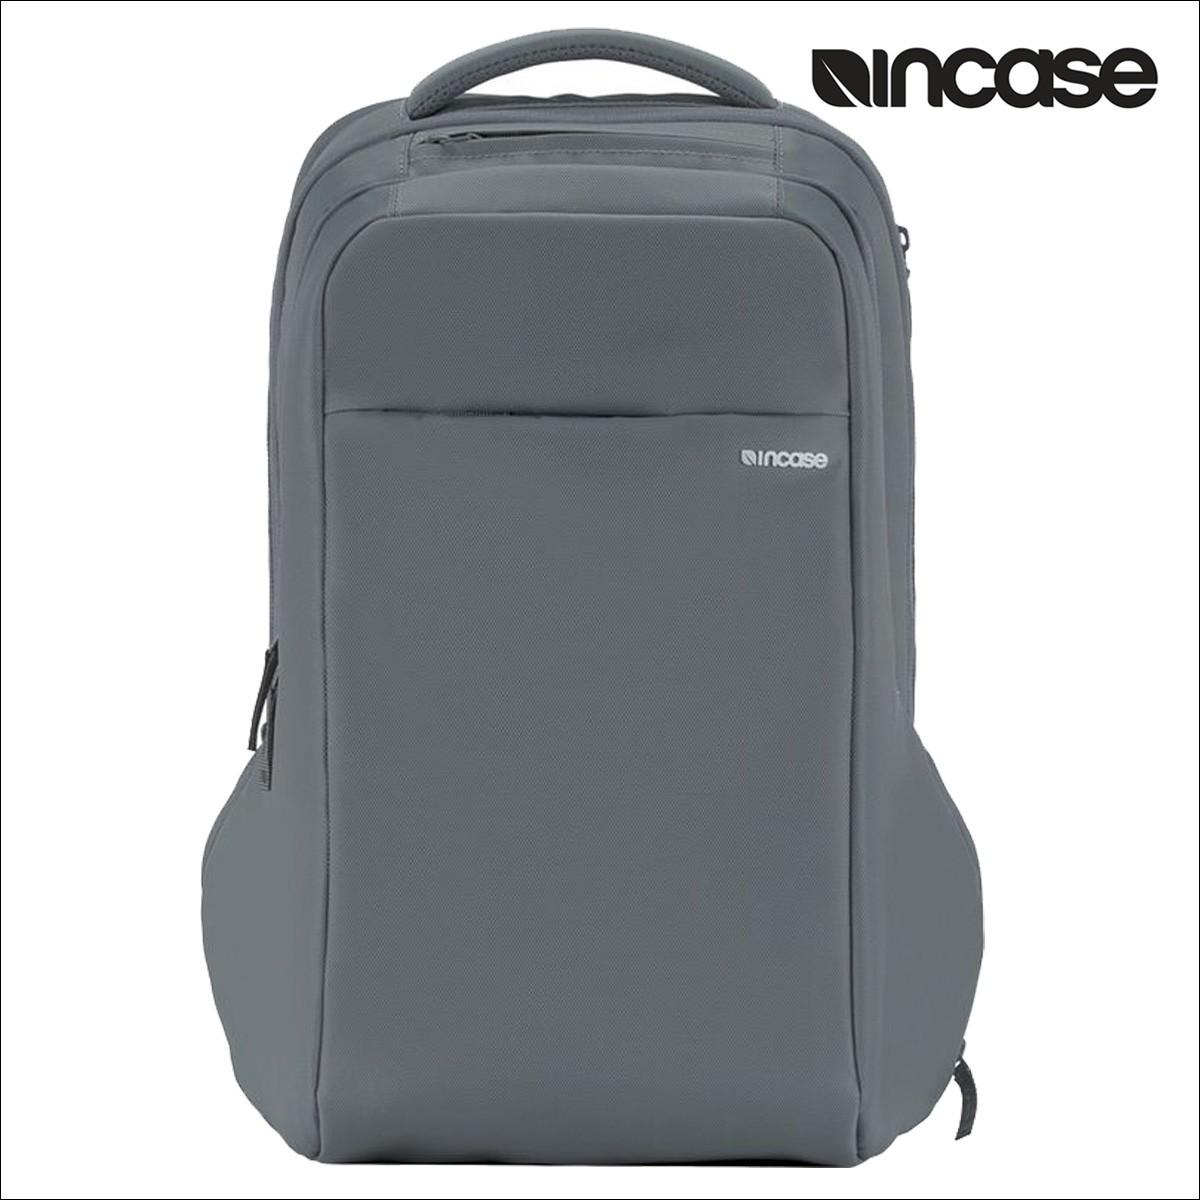 INCASE インケース バックパック リュック 20L ICON BACKPACK CL55533 レディース メンズ グレー [4/11 新入荷]